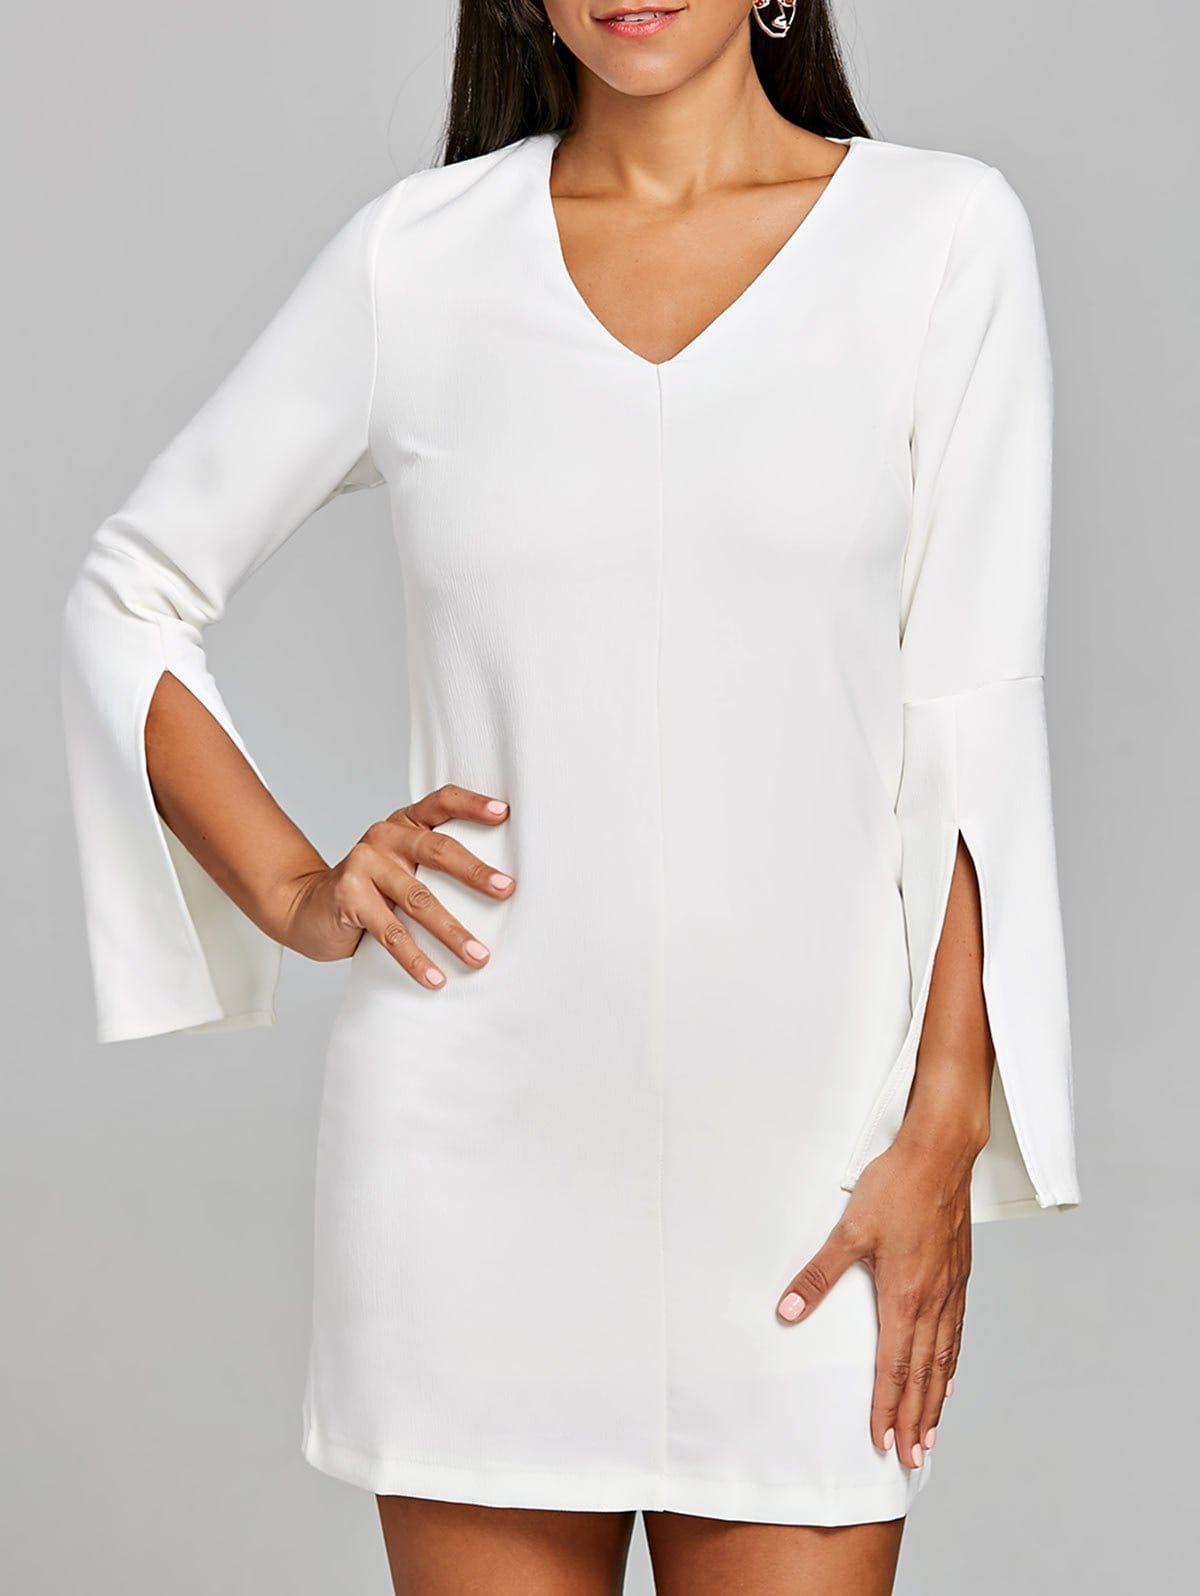 Elegant White Dresslily Dress by Tamara Bellis